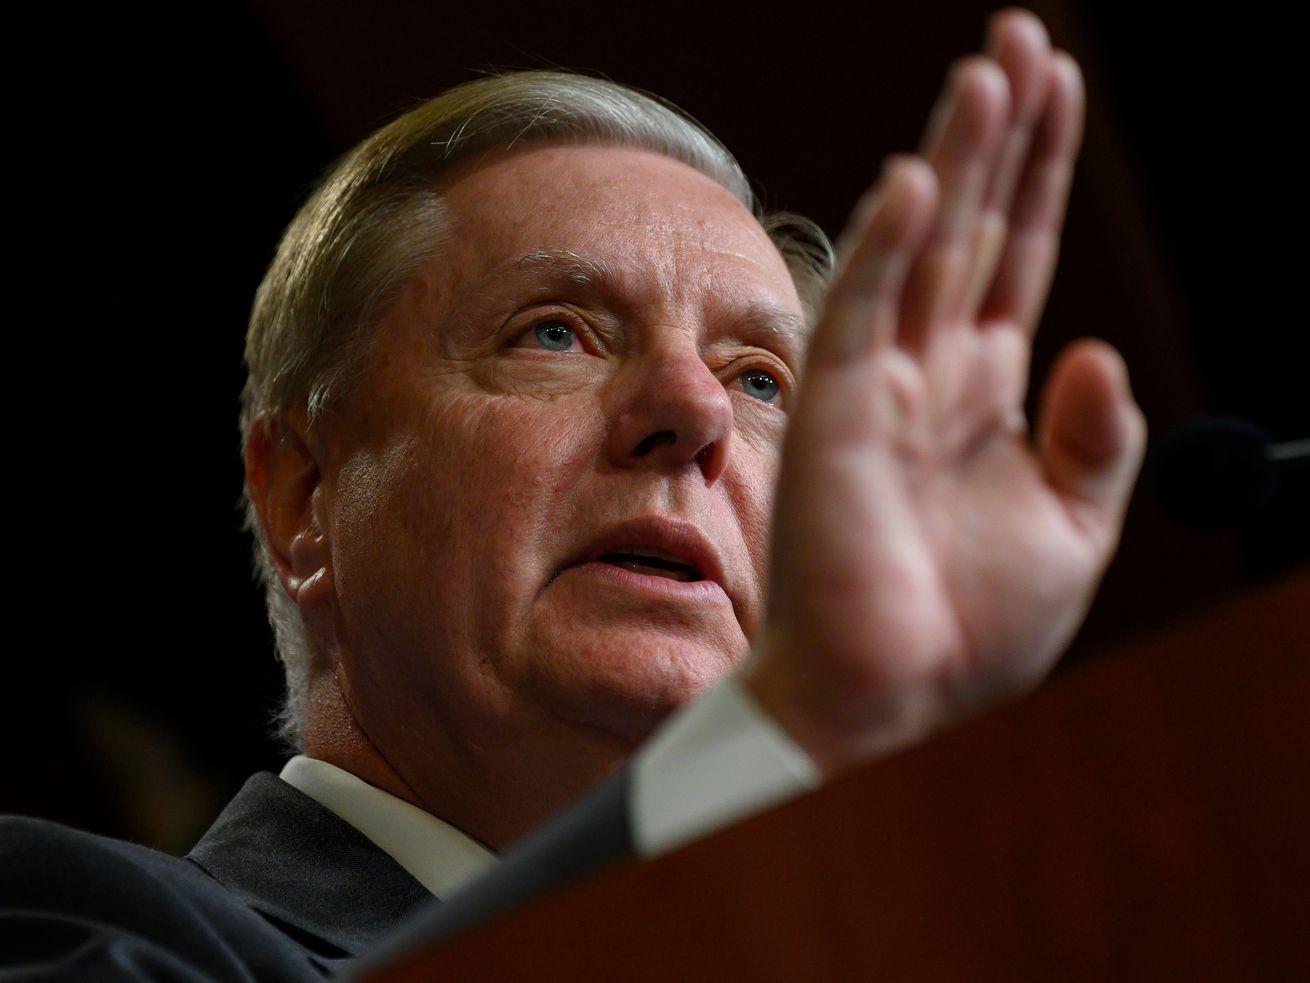 Senator Lindsey Graham holds up his hand while speaking.